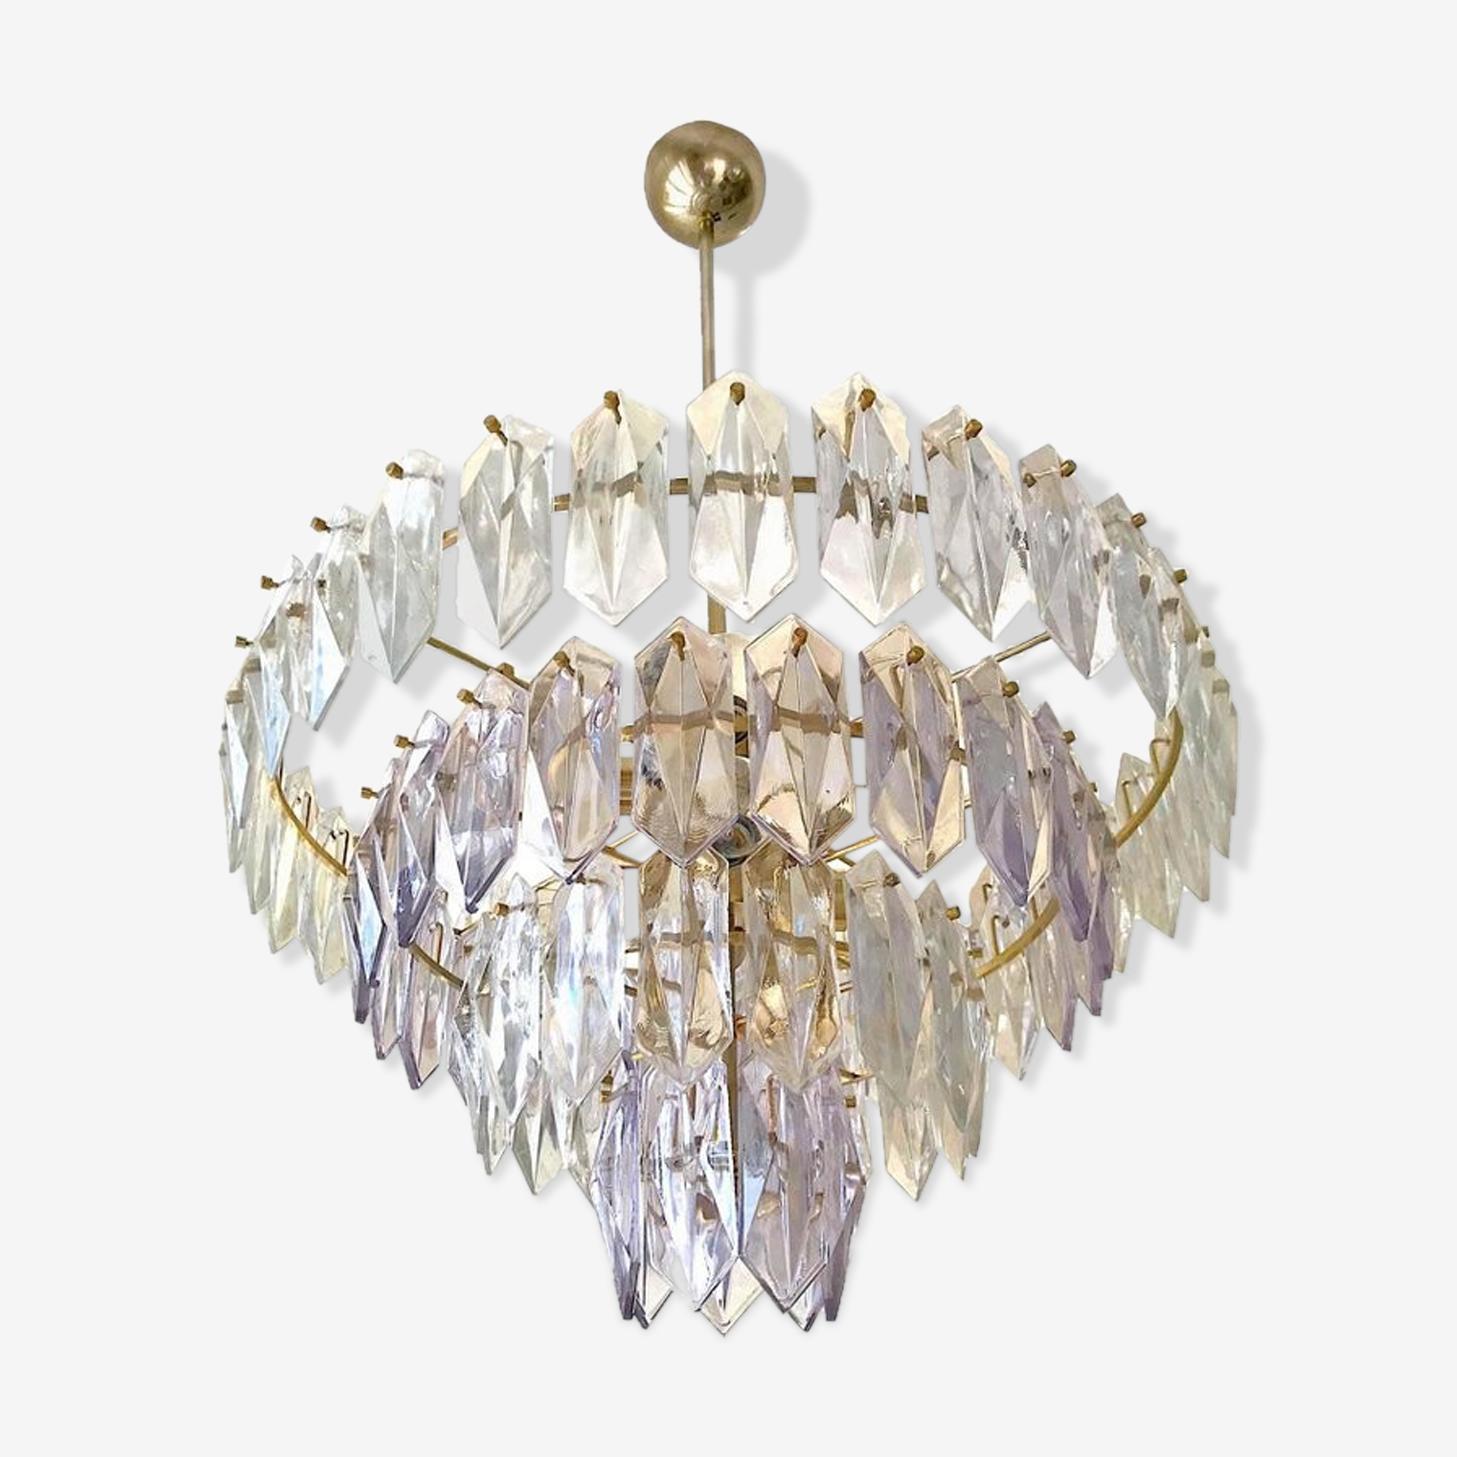 Glass chandelier Kinkeldey 1960